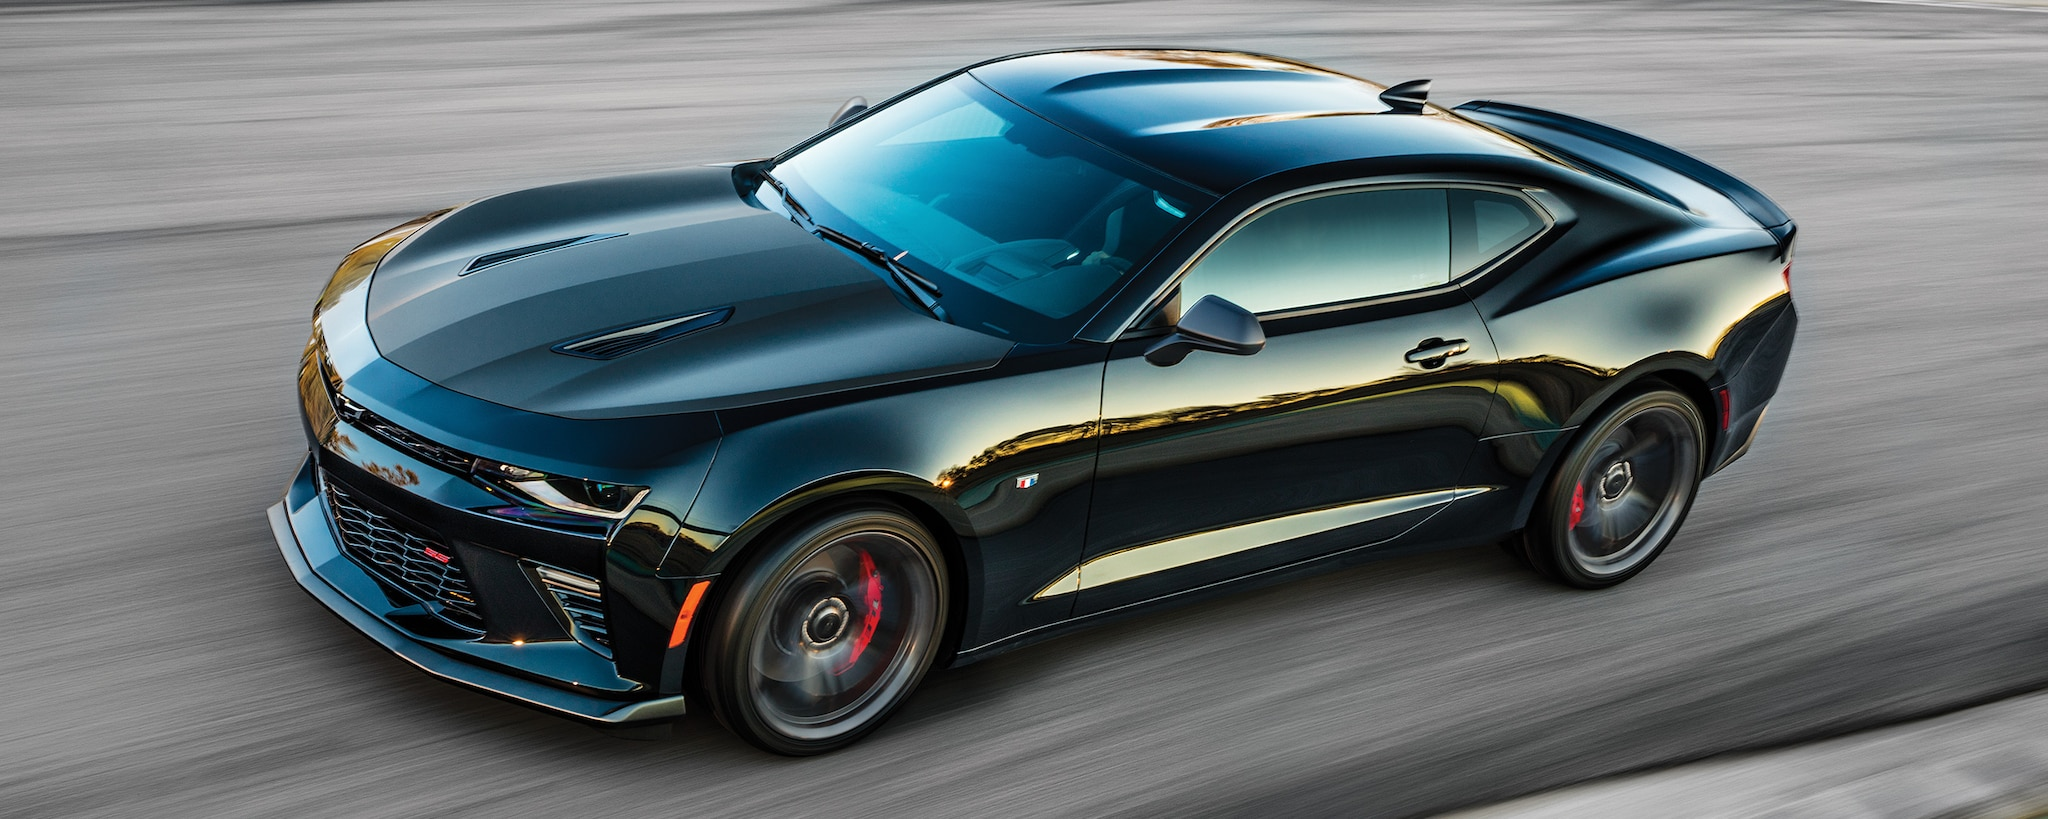 Mejoras Para Tu Veh 237 Culo Deportivo Chevrolet Performance